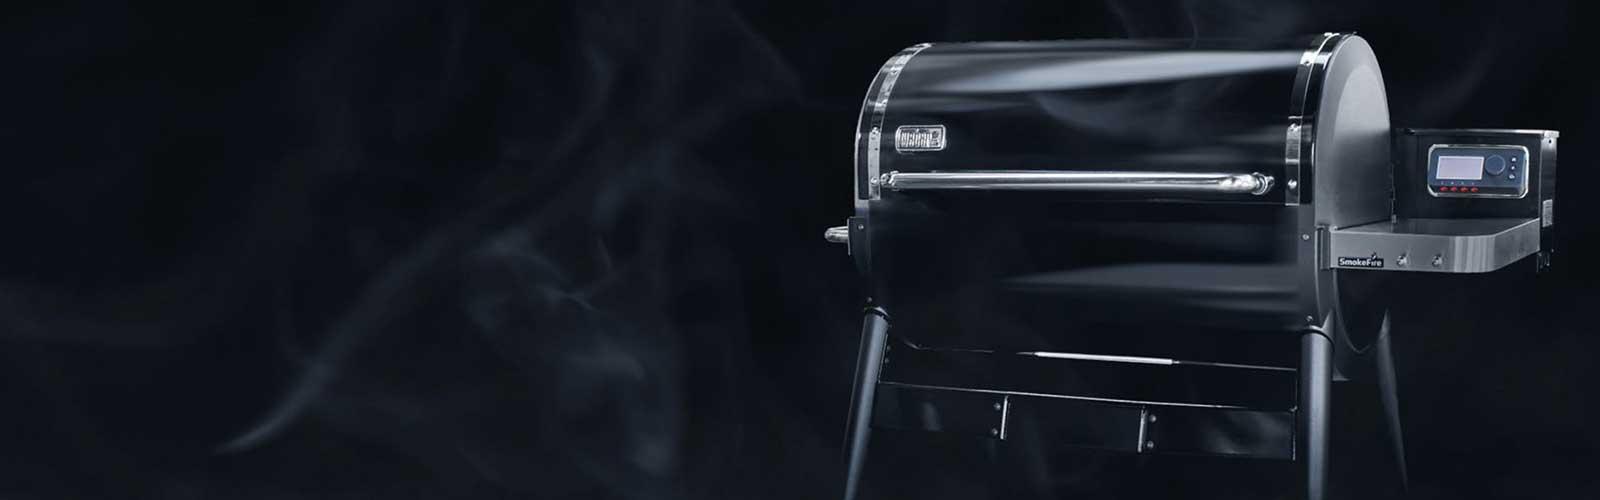 Nová řada peletových grilů Weber SmokeFire